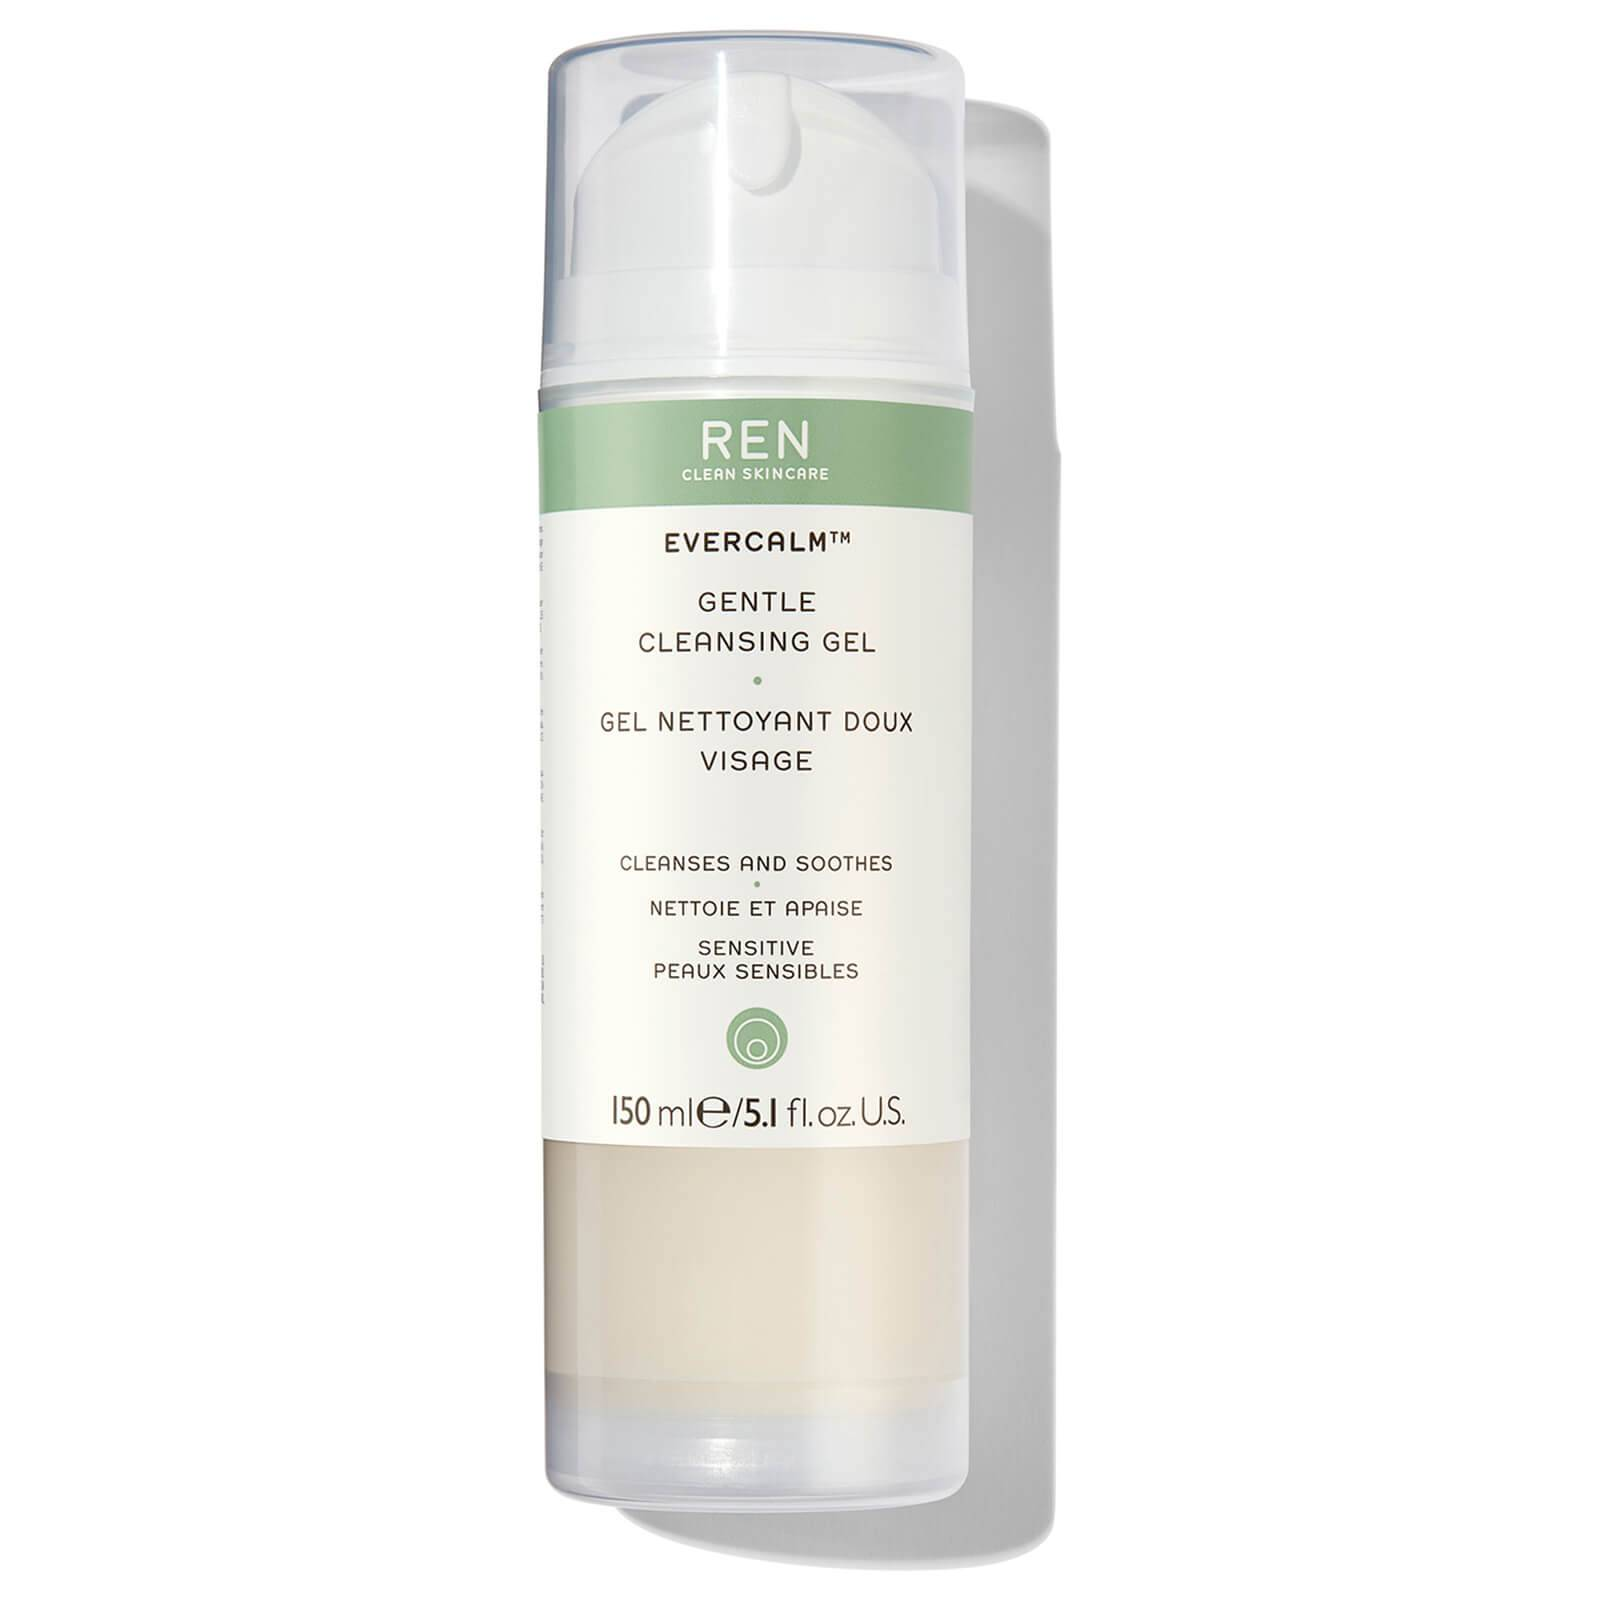 REN Clean Skincare REN Evercalm™ Gentle Cleansing Gel